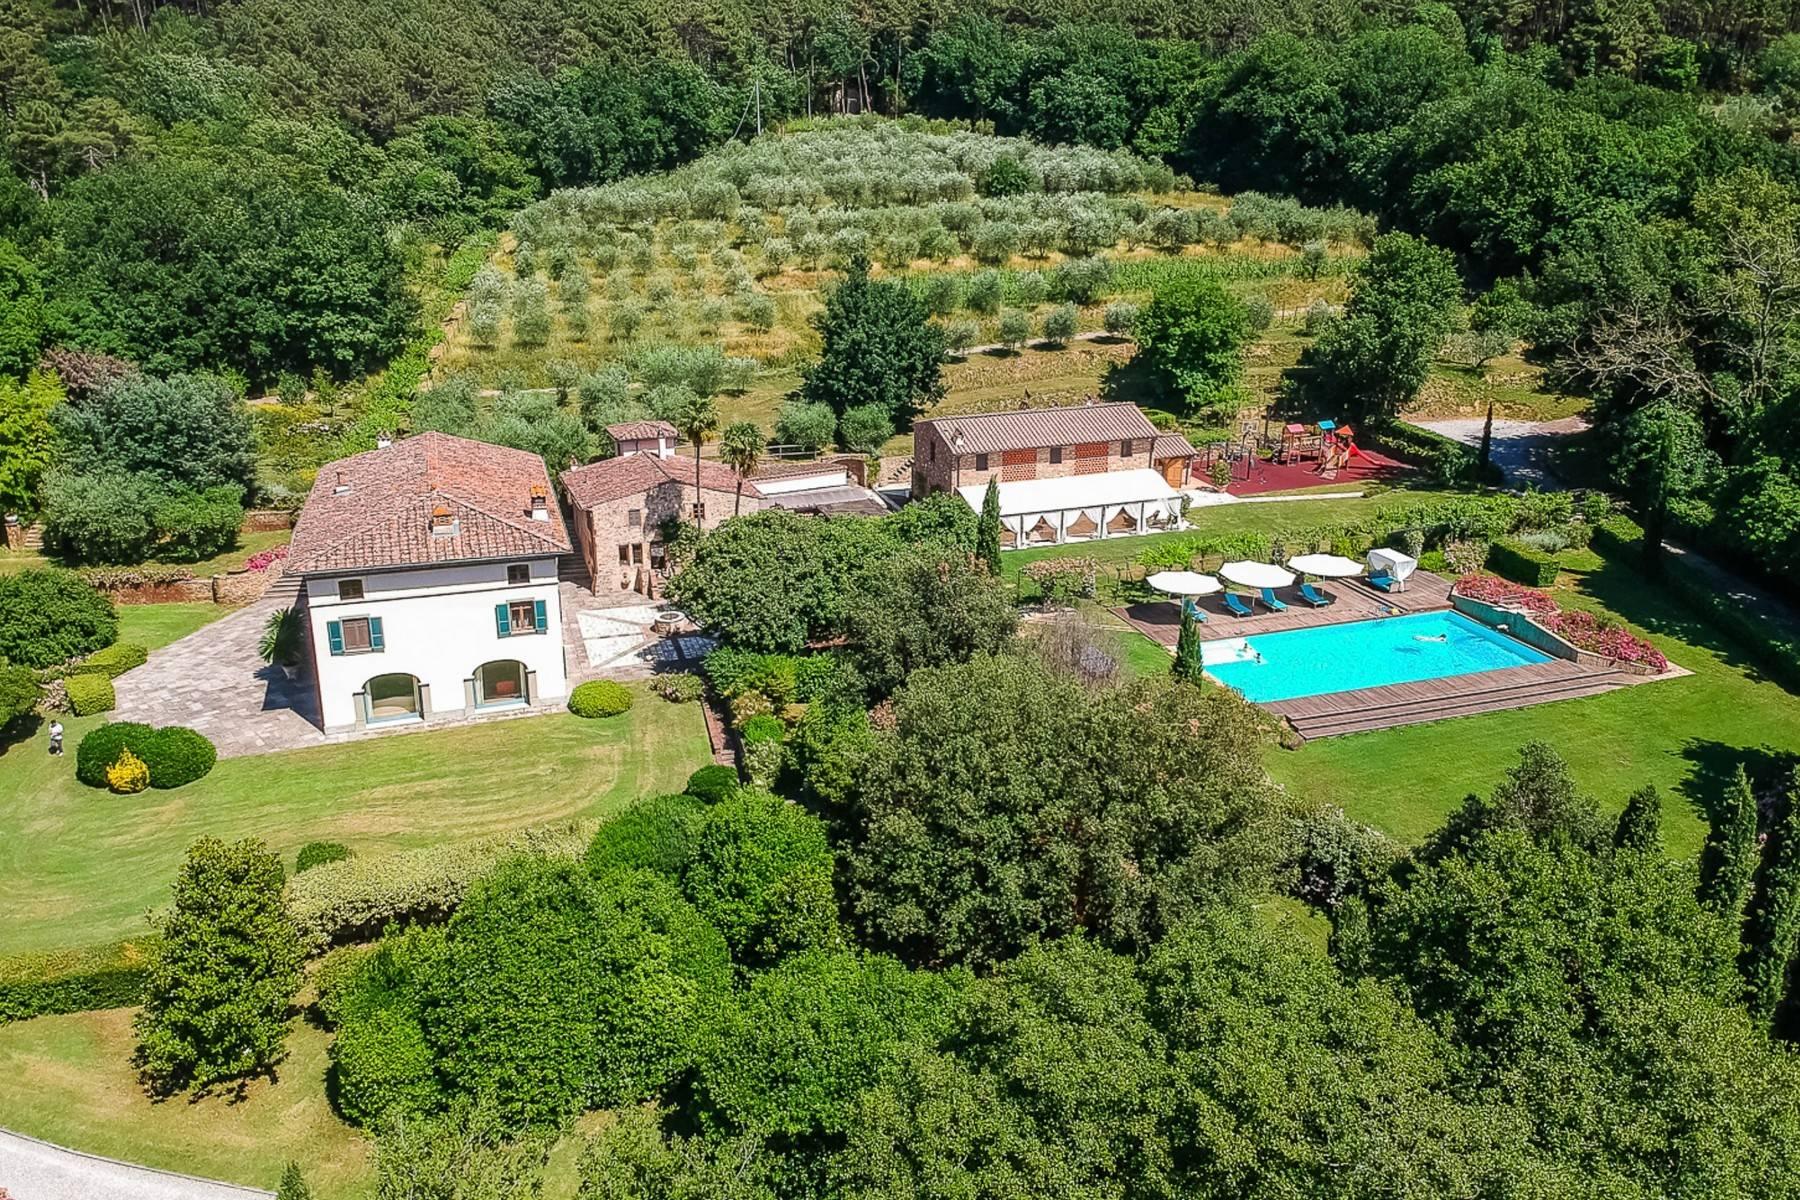 Villa in Vendita a Lucca: 5 locali, 1130 mq - Foto 14